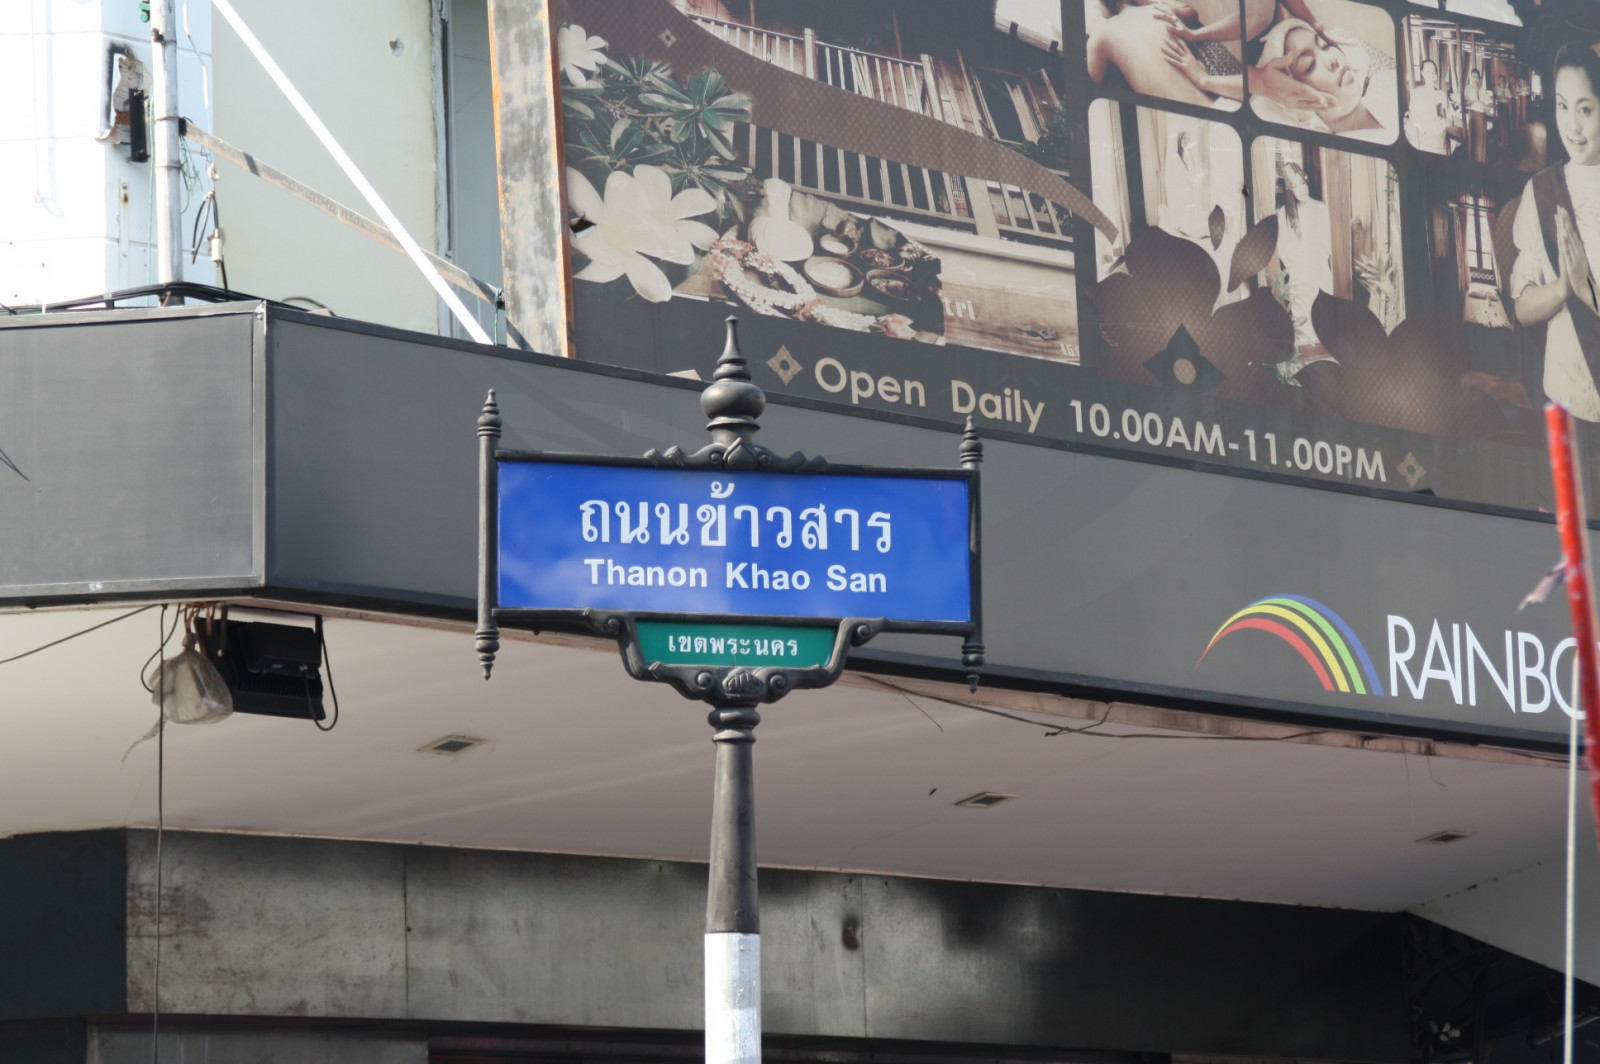 khoasanroad-www.singapbyart.com